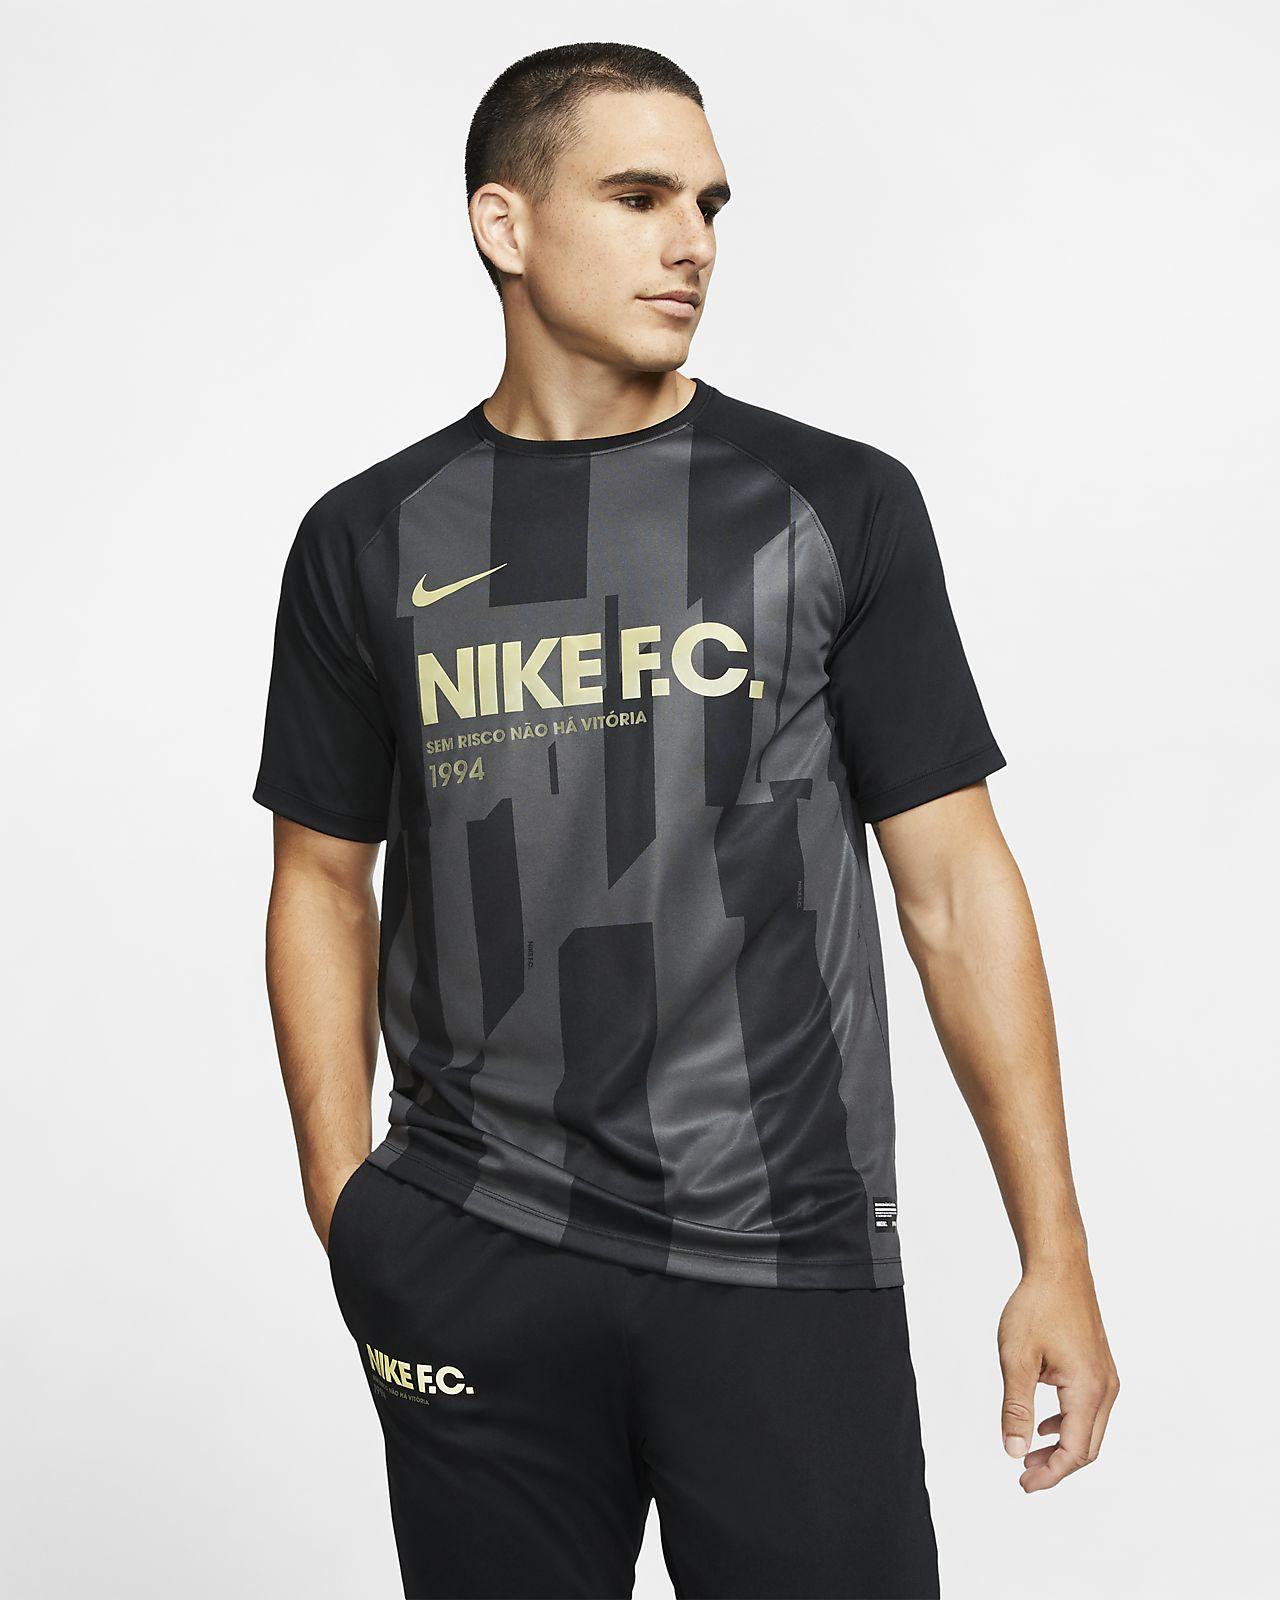 Nike F.C. rövid ujjú férfimez